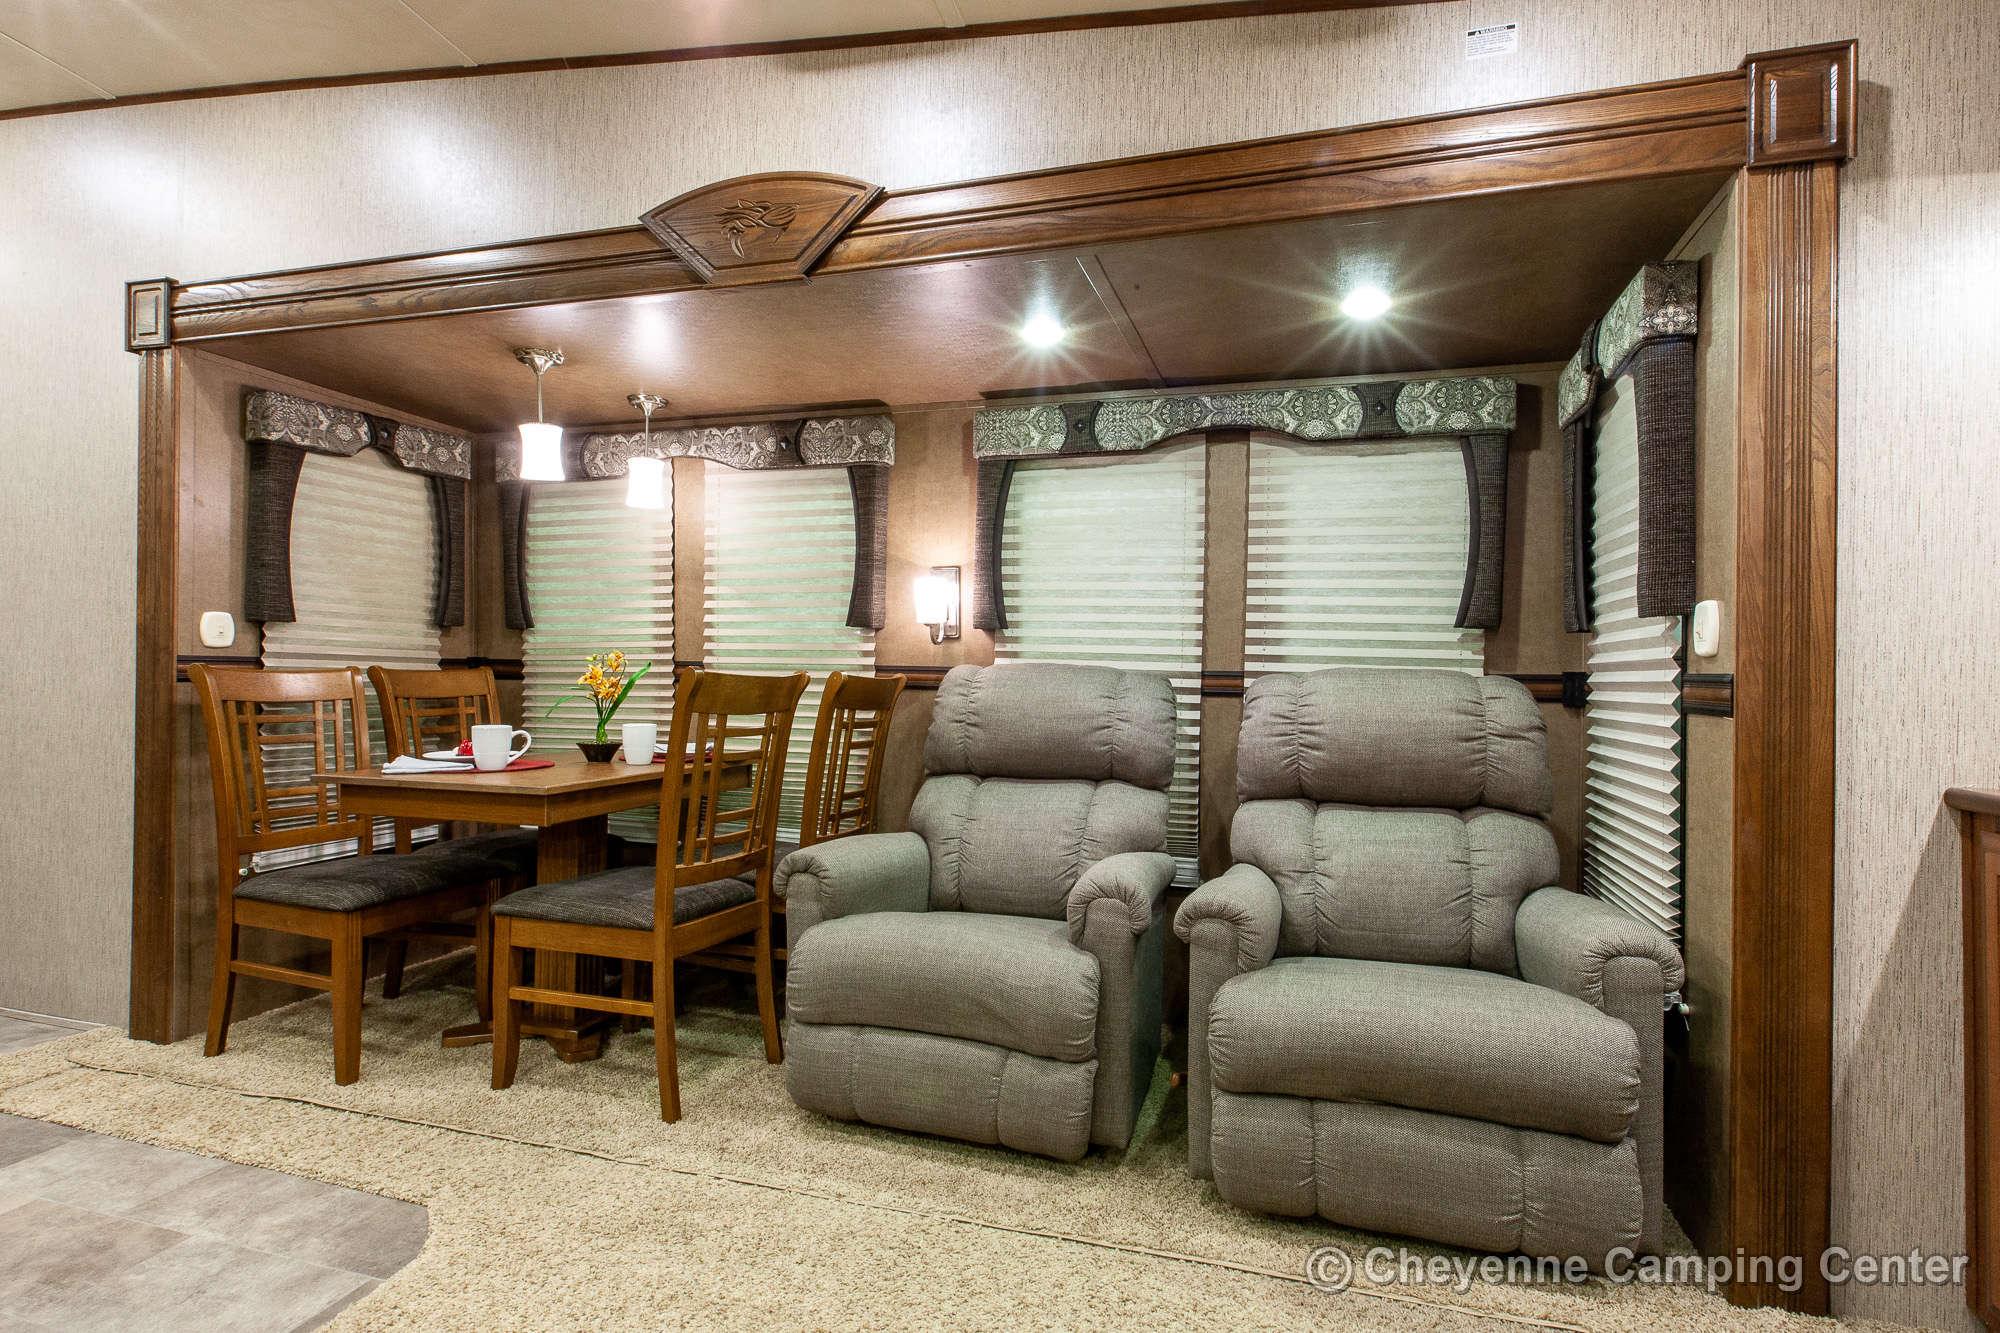 2015 Forest River Sabre 34RLQS-6 Fifth Wheel Interior Image